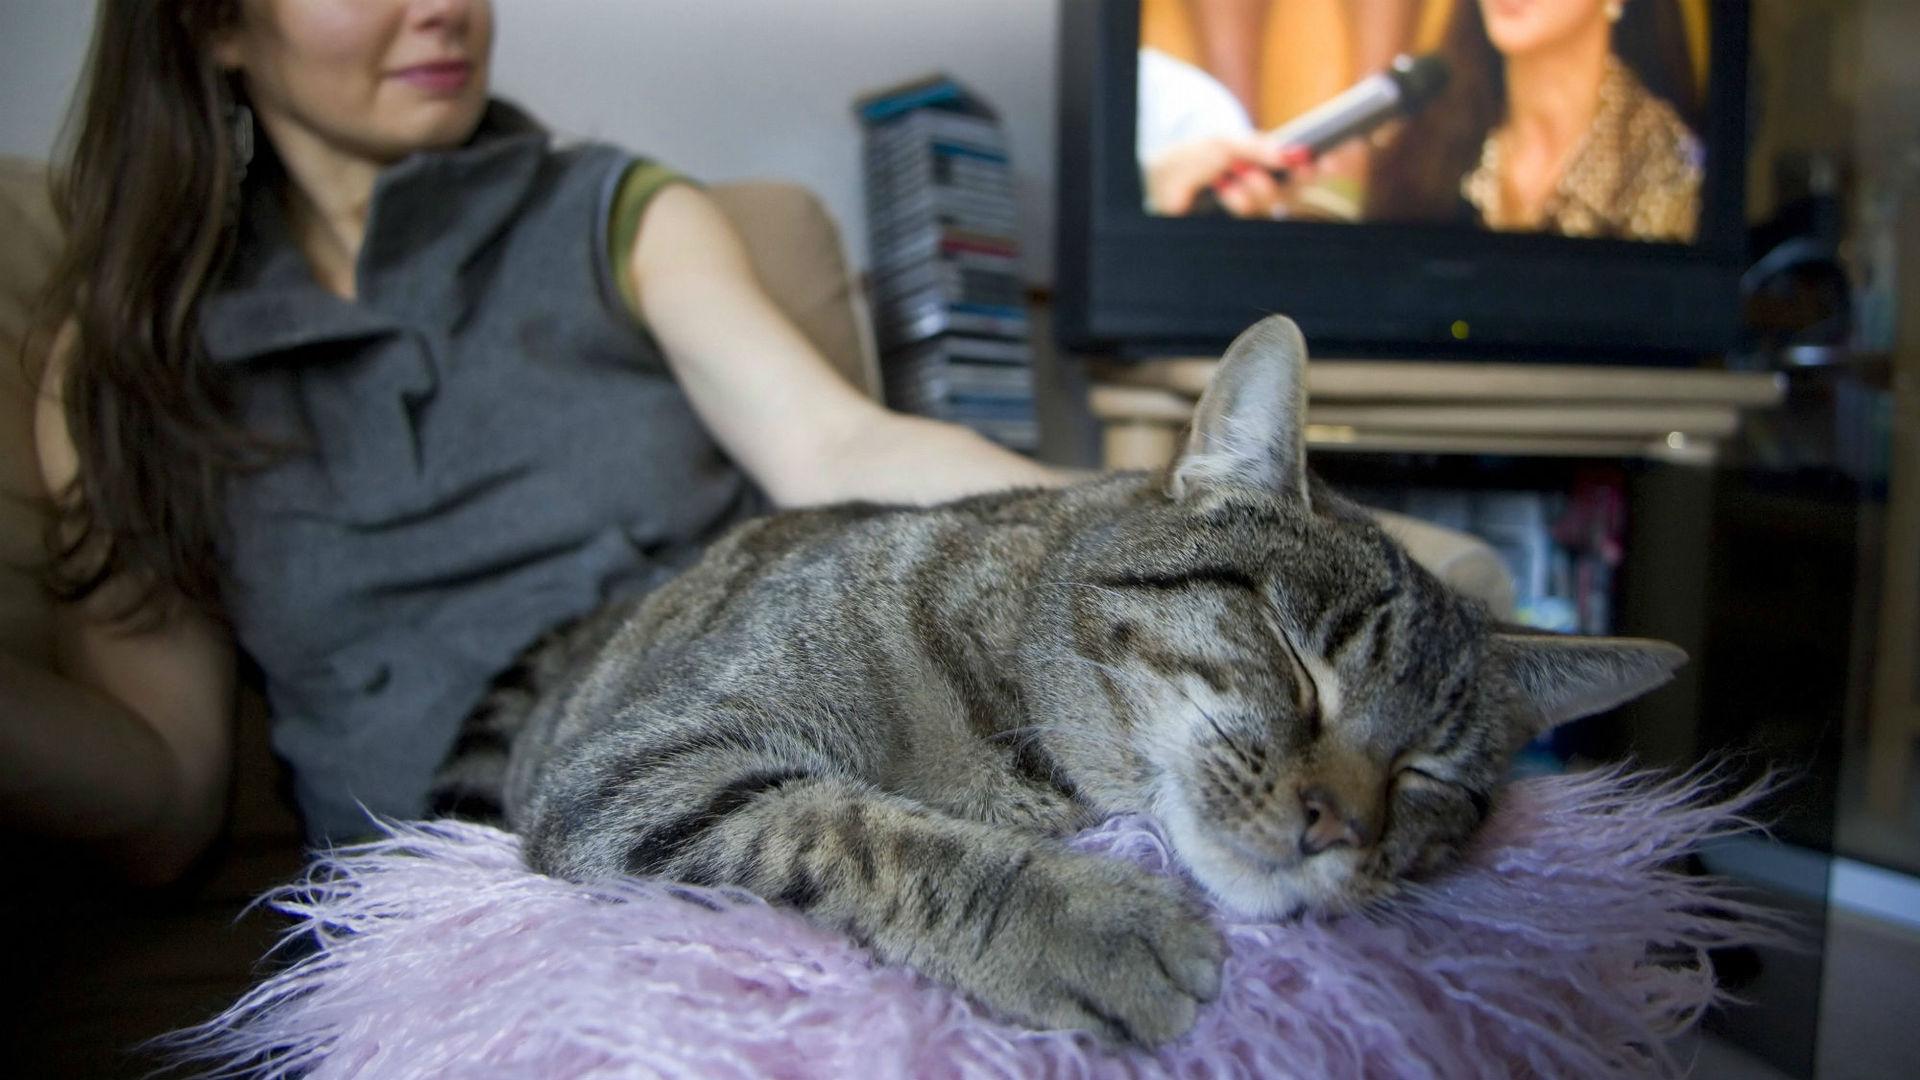 Как настроение хозяина влияет на кошку